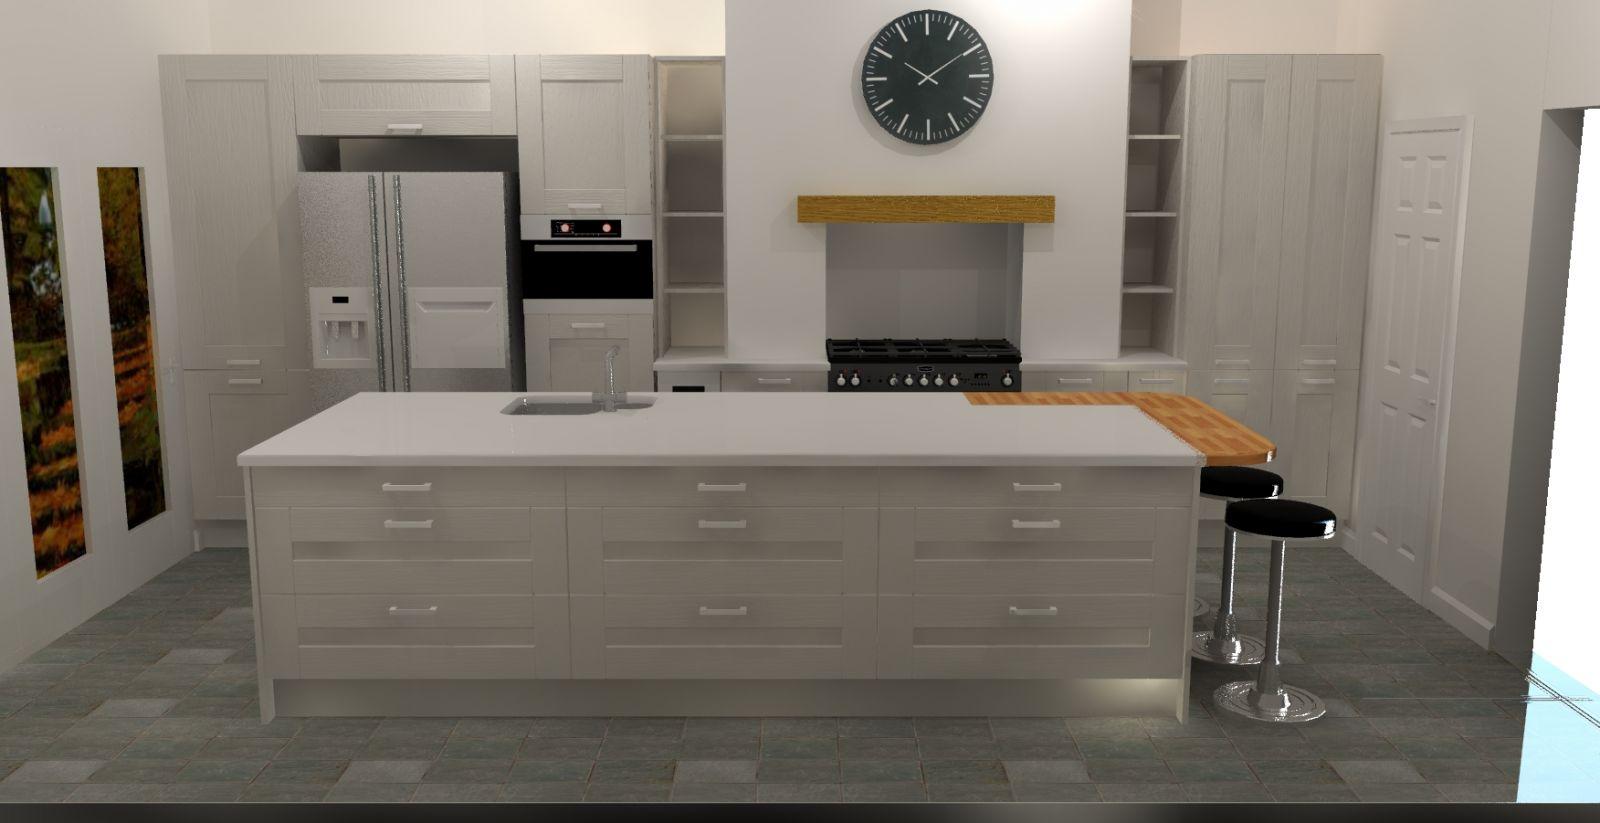 Iona Painted Kitchen Units And Doors Rigid Built Kitchens Kitchen Stori Ebay